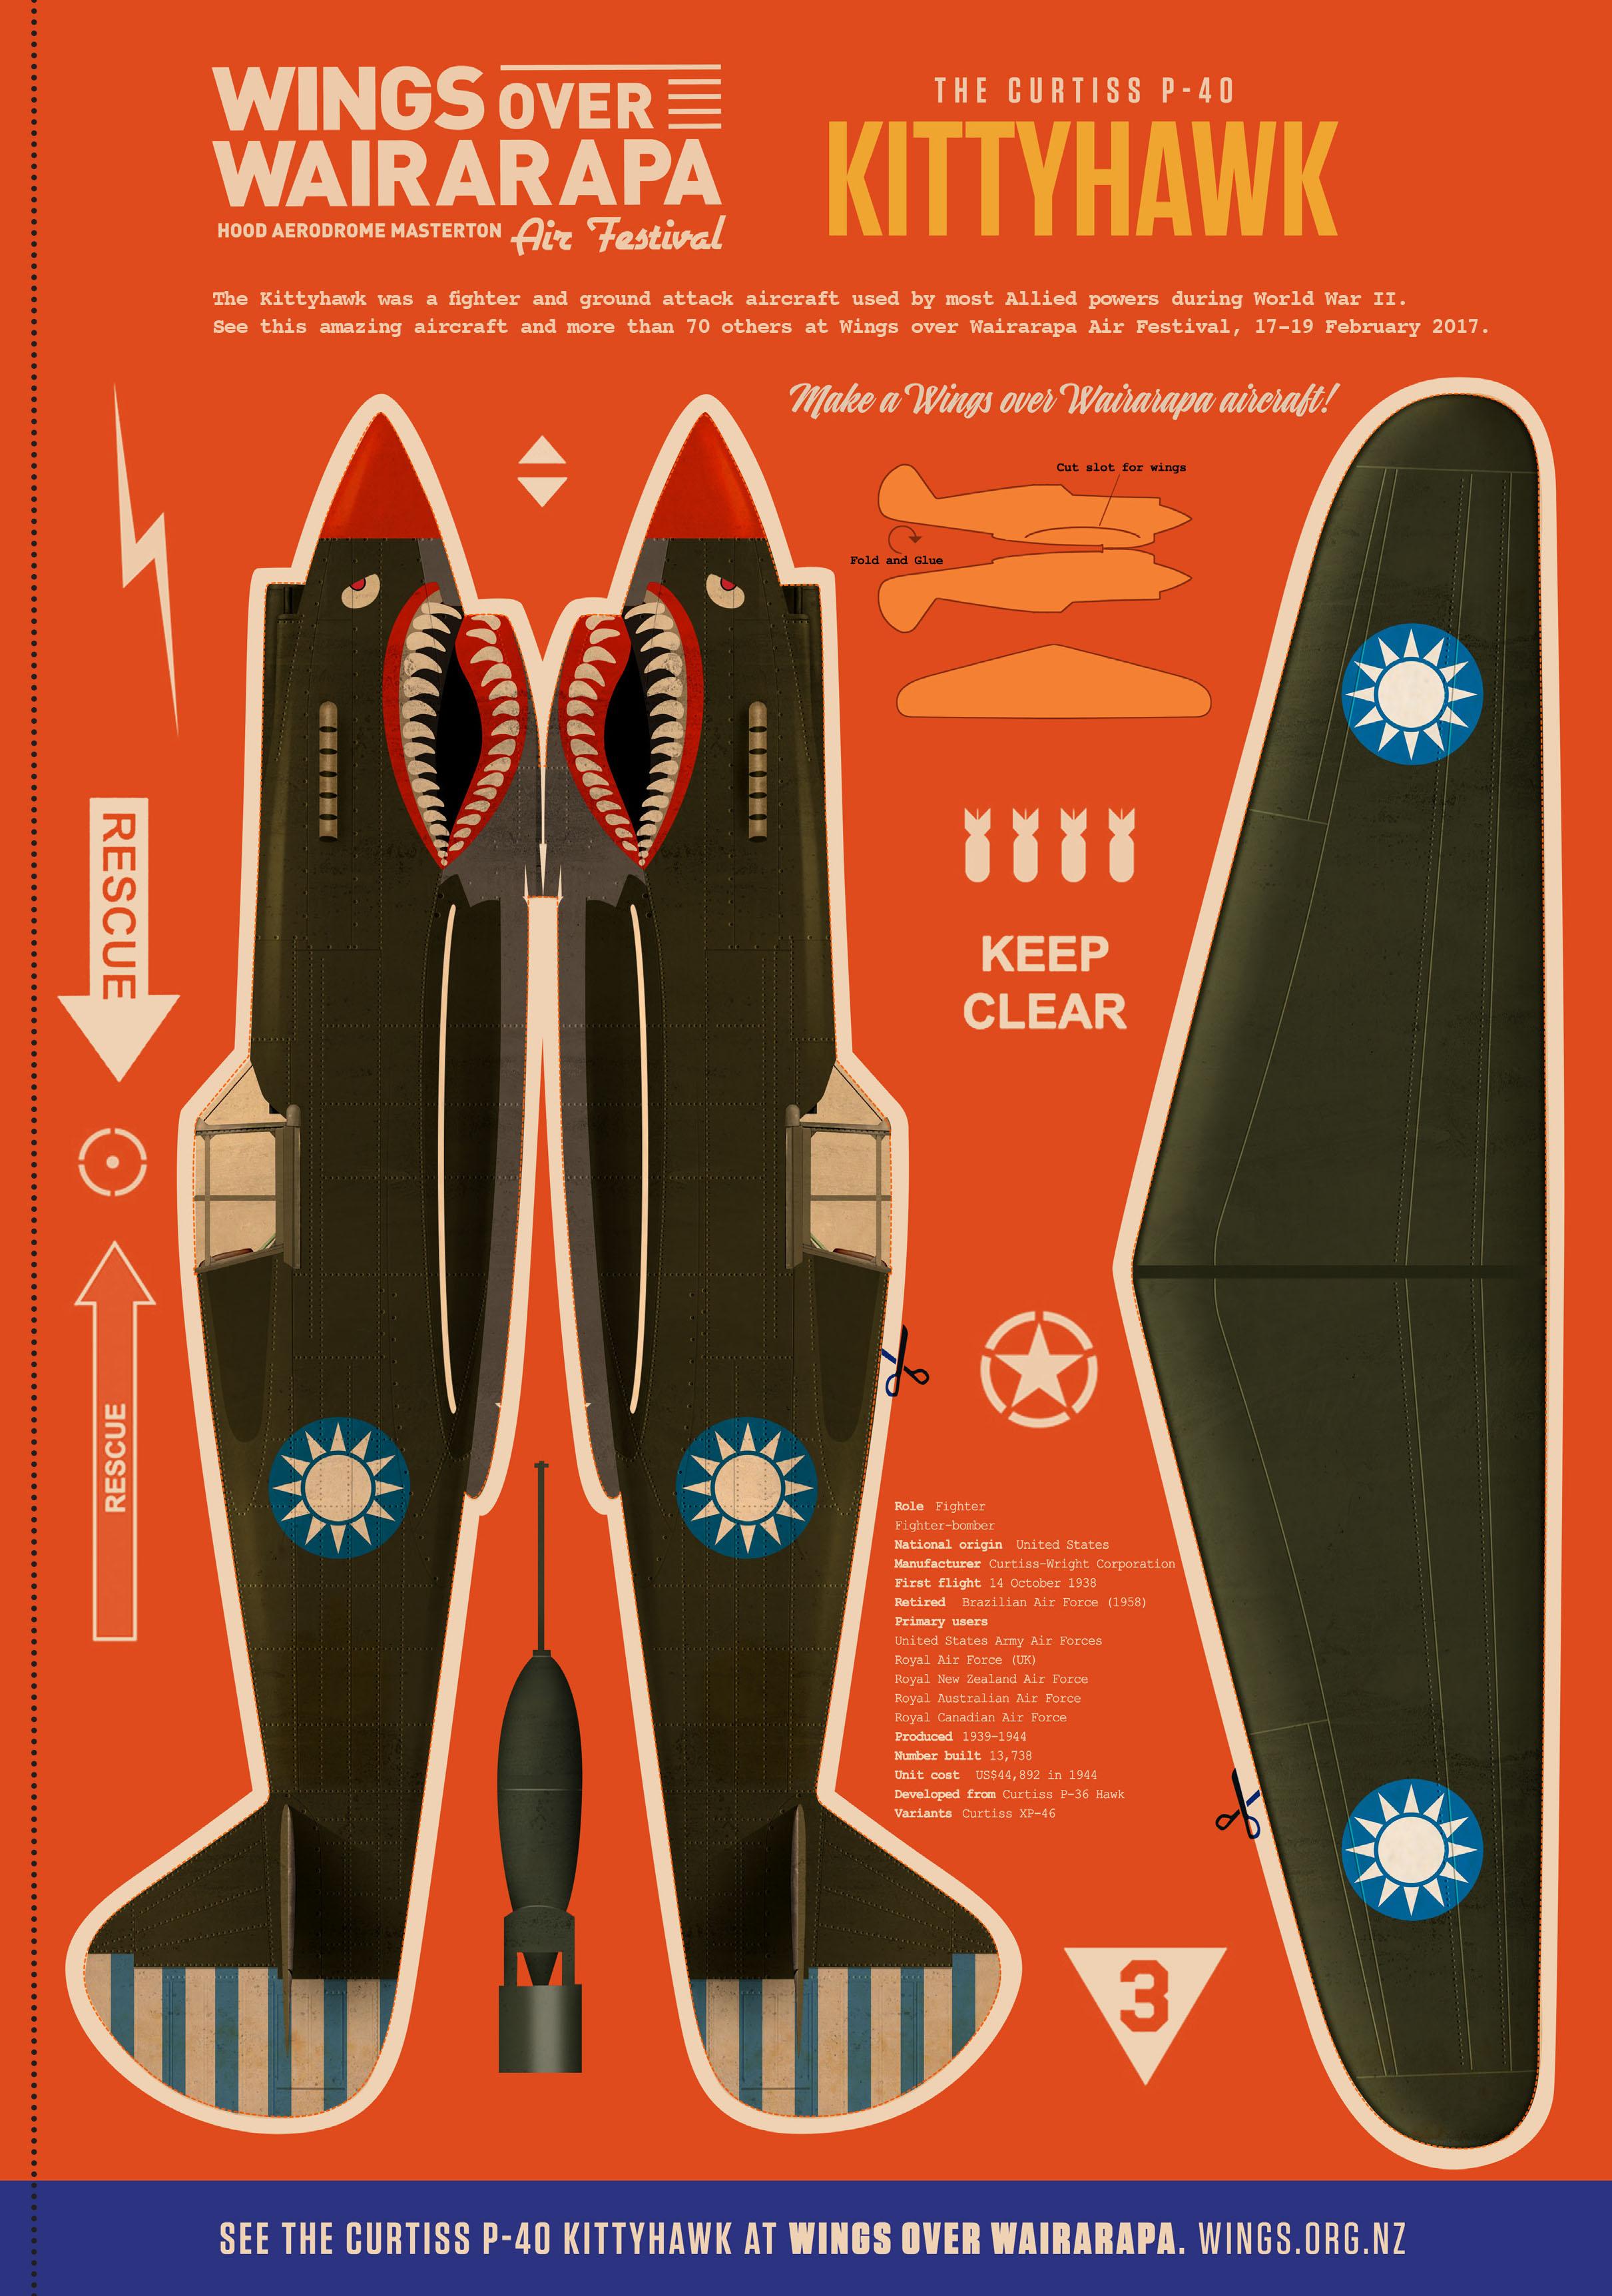 Kittyhawk and Spitfire Models